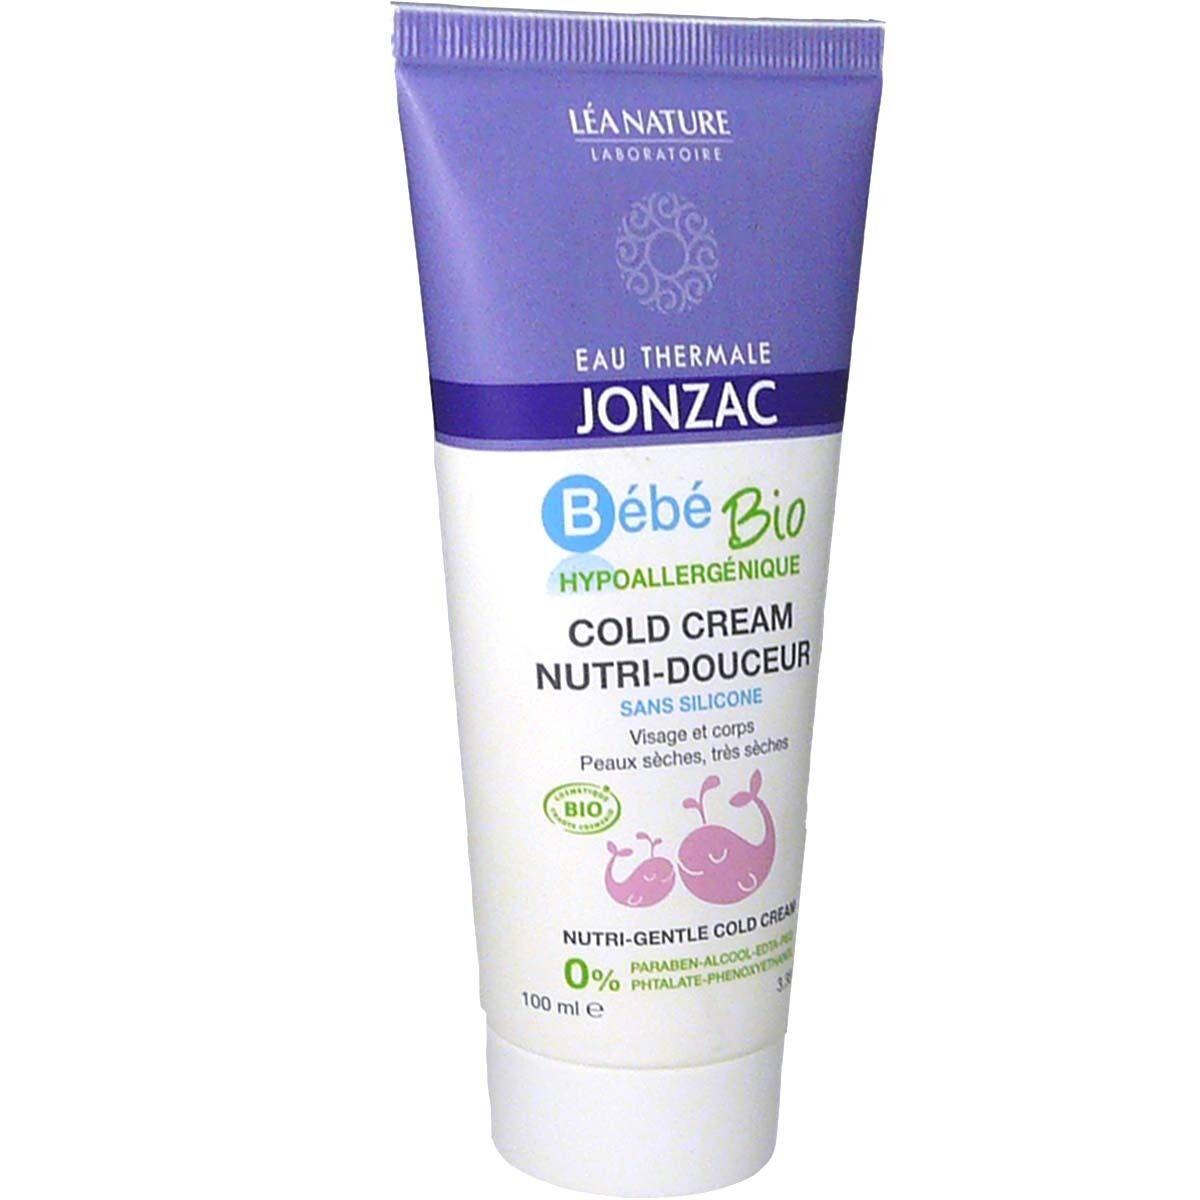 Jonzac bebe bio cold cream nutri-douceur 100ml